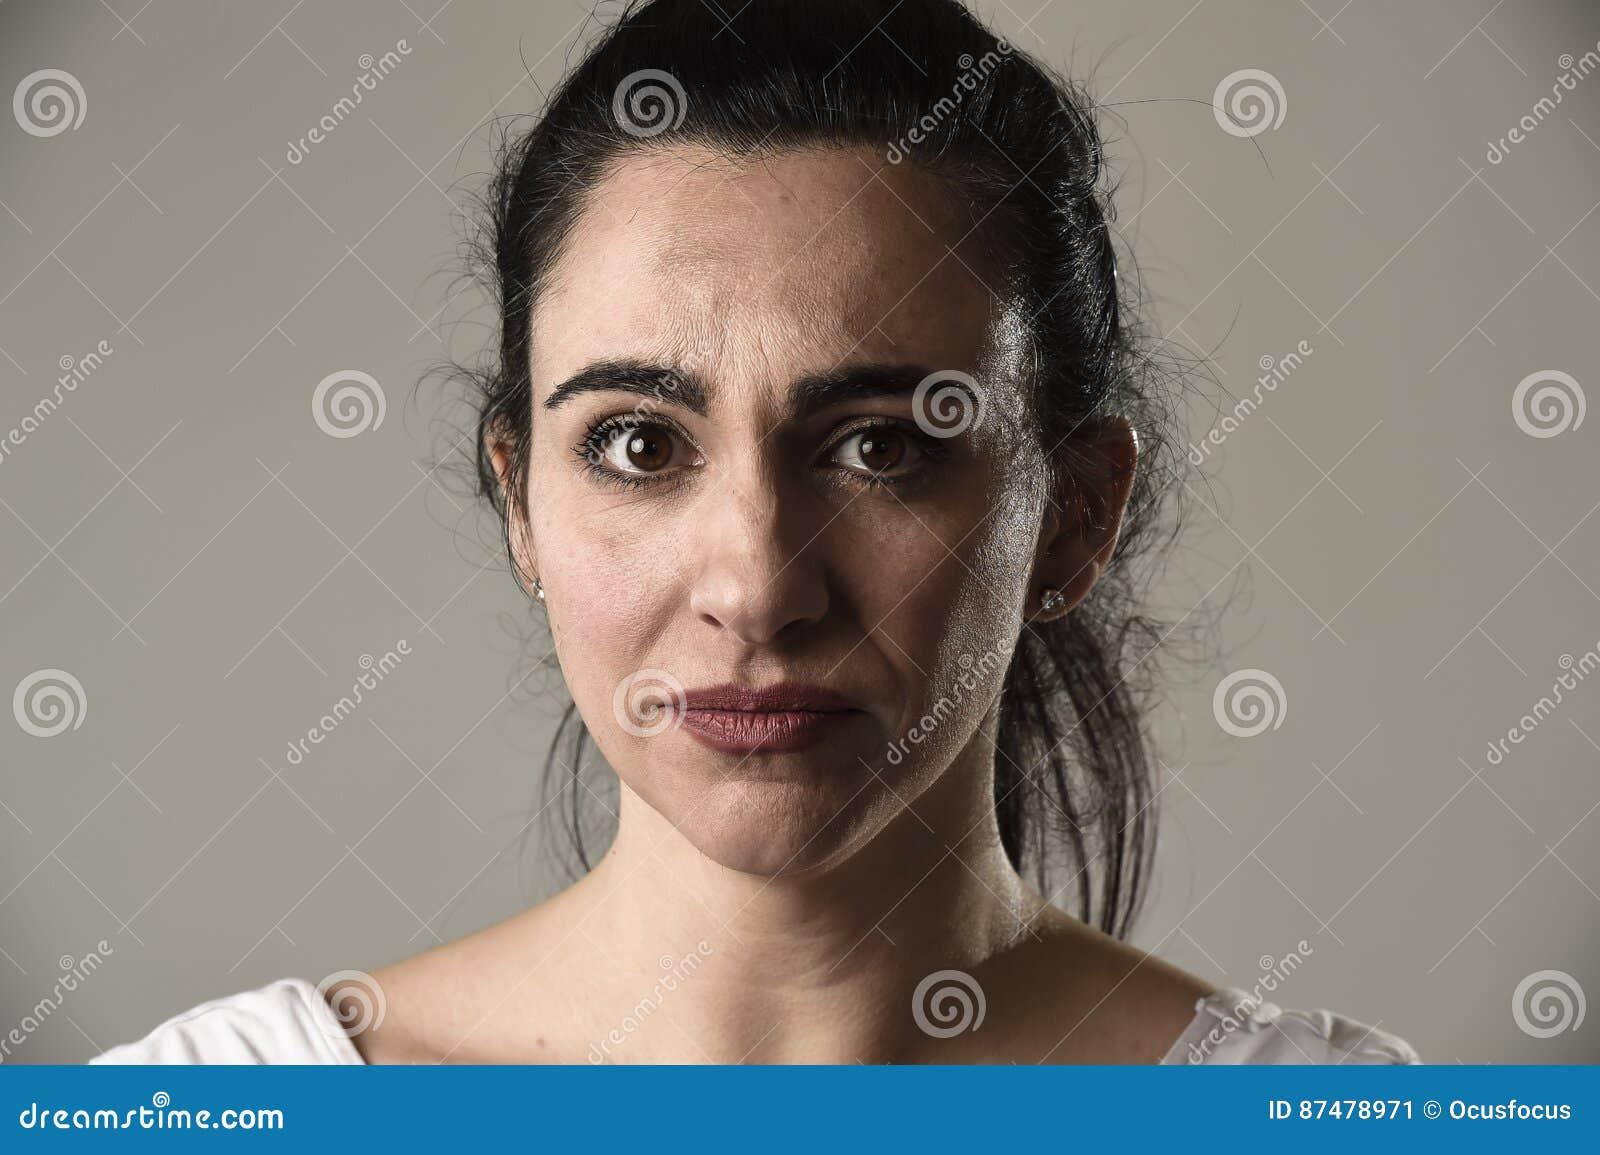 Смс девушке про ее красивые глаза